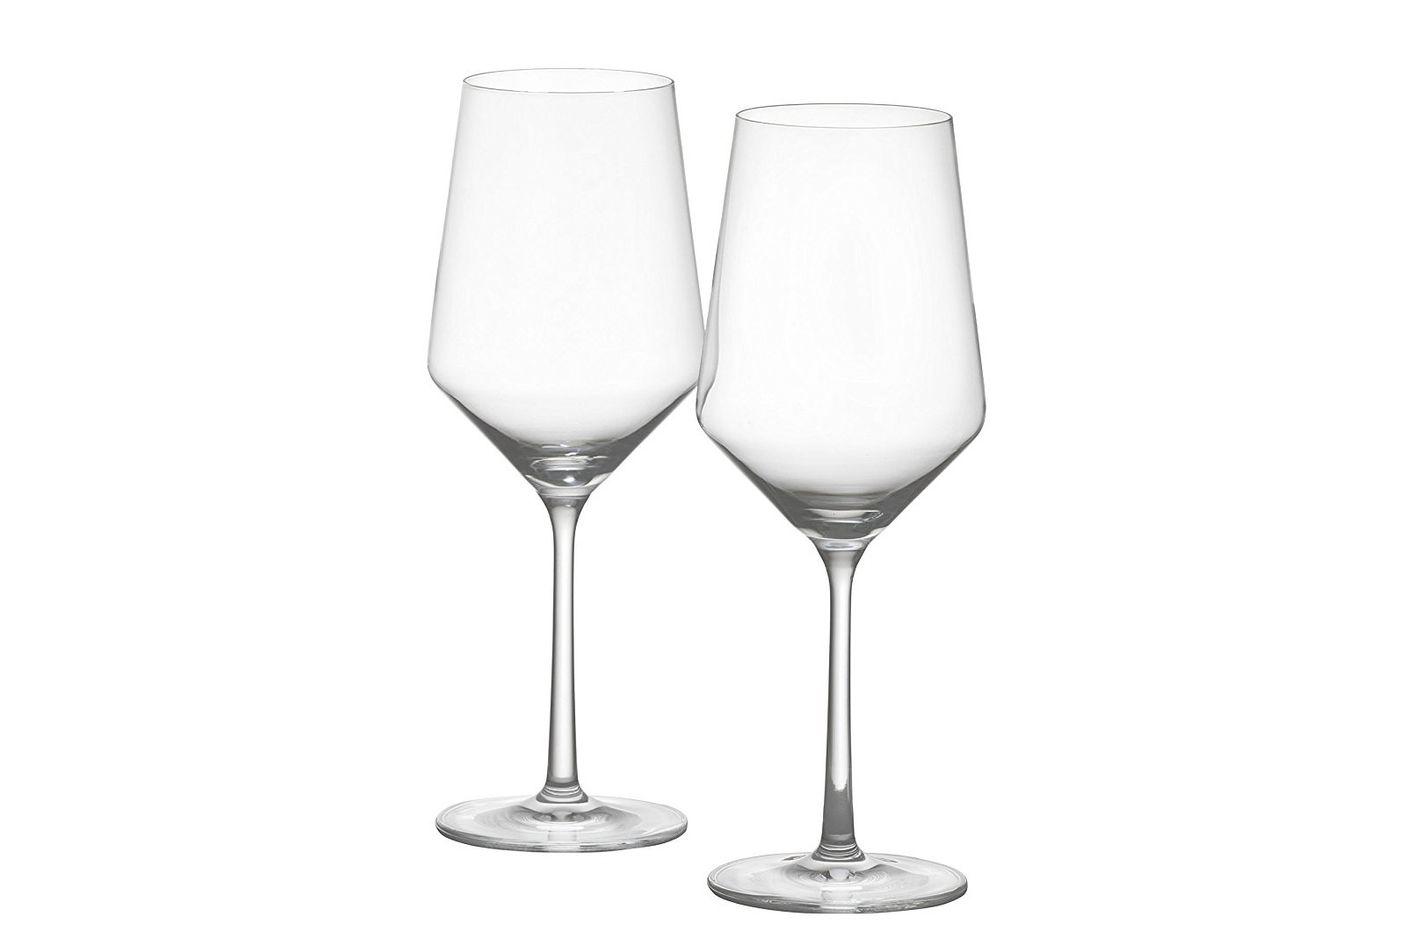 Schott Zwiesel Tritan Crystal Glass Stemware Pure Collection Wine Glass, 18.2-Ounce, Set of 2